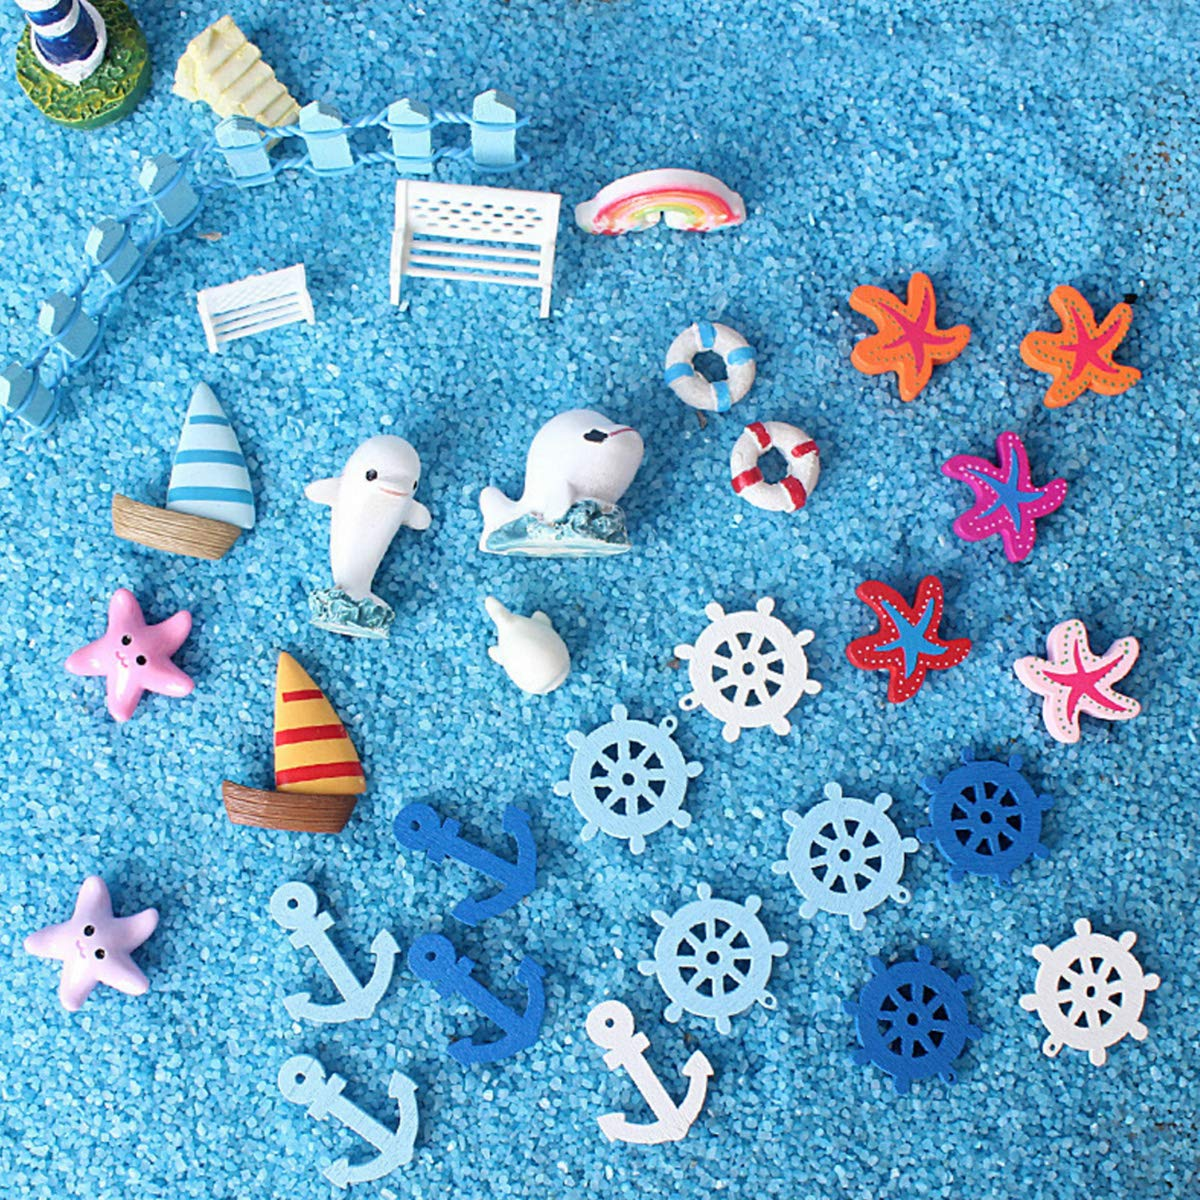 Miniature Garden Ornaments, Ocean Style Dollhouse Decoration, 60 Pcs Miniature Ornaments Kit Set DIY Fairy Garden Dollhouse Decoration